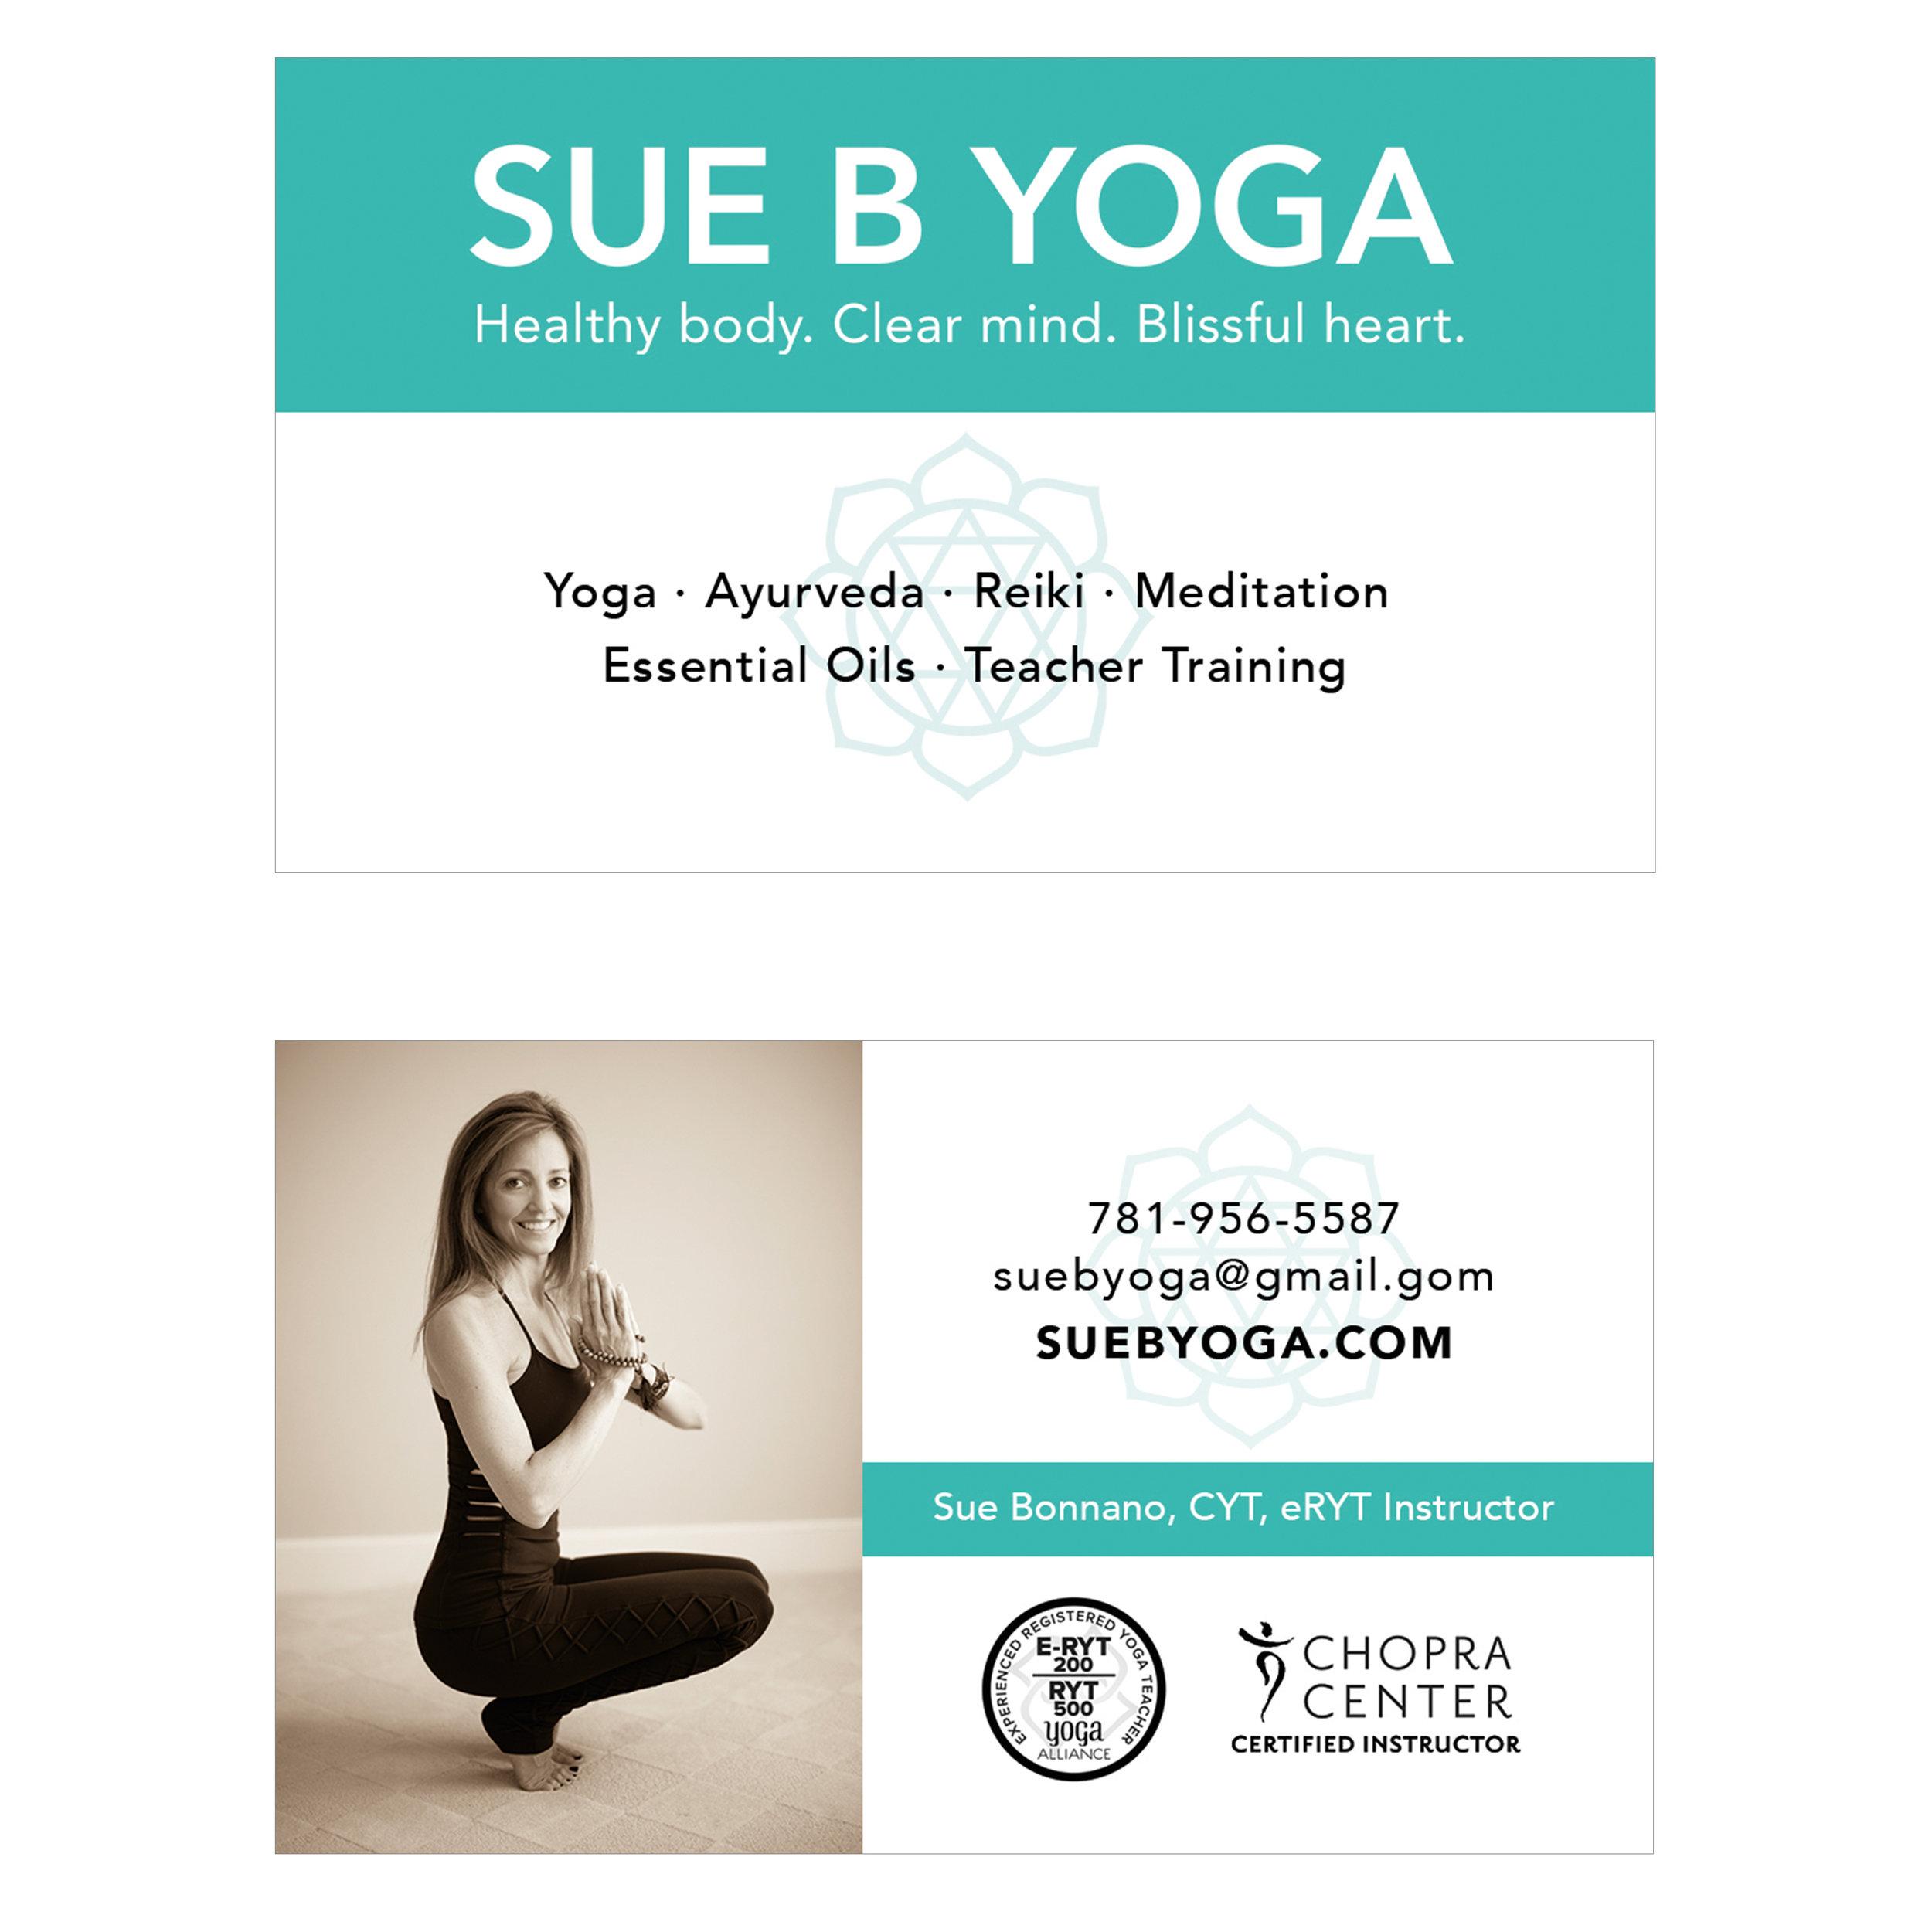 yoga instructor logo business card design